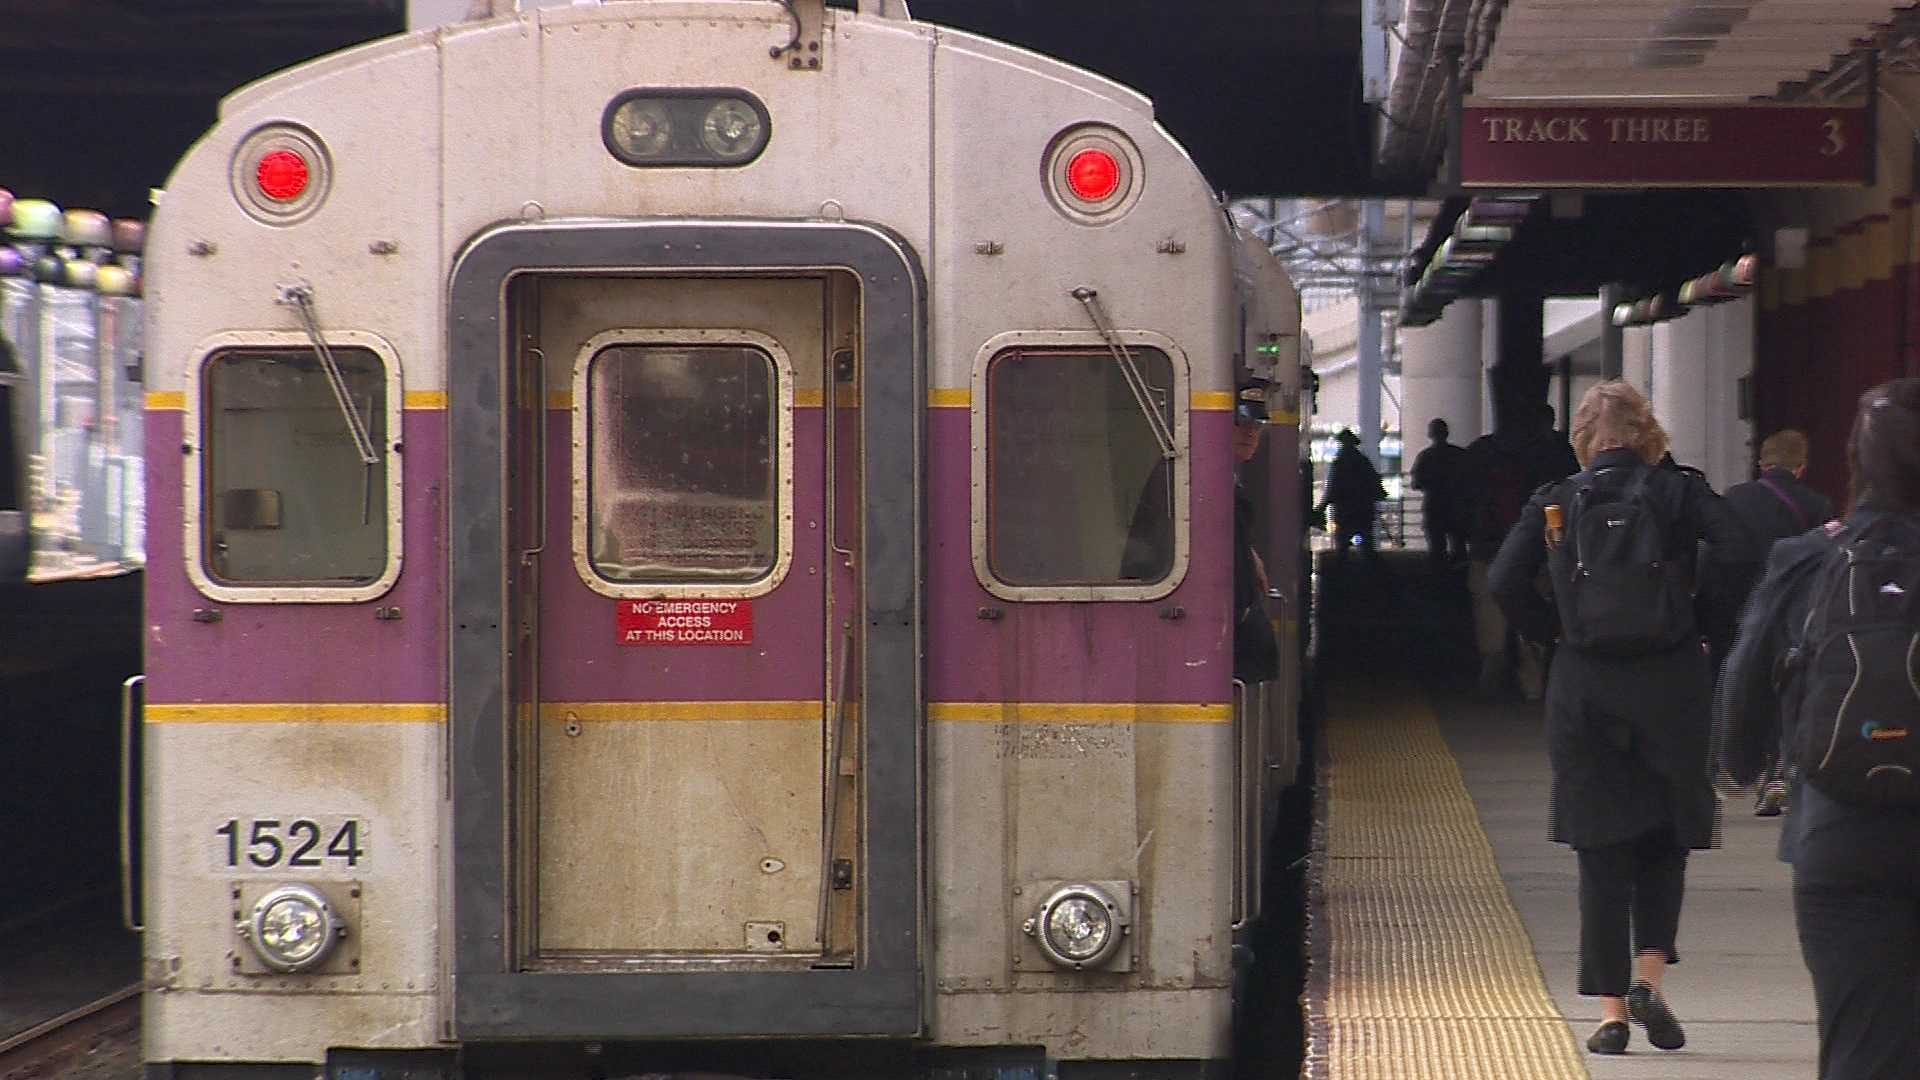 MBTA Commuter Train Generic